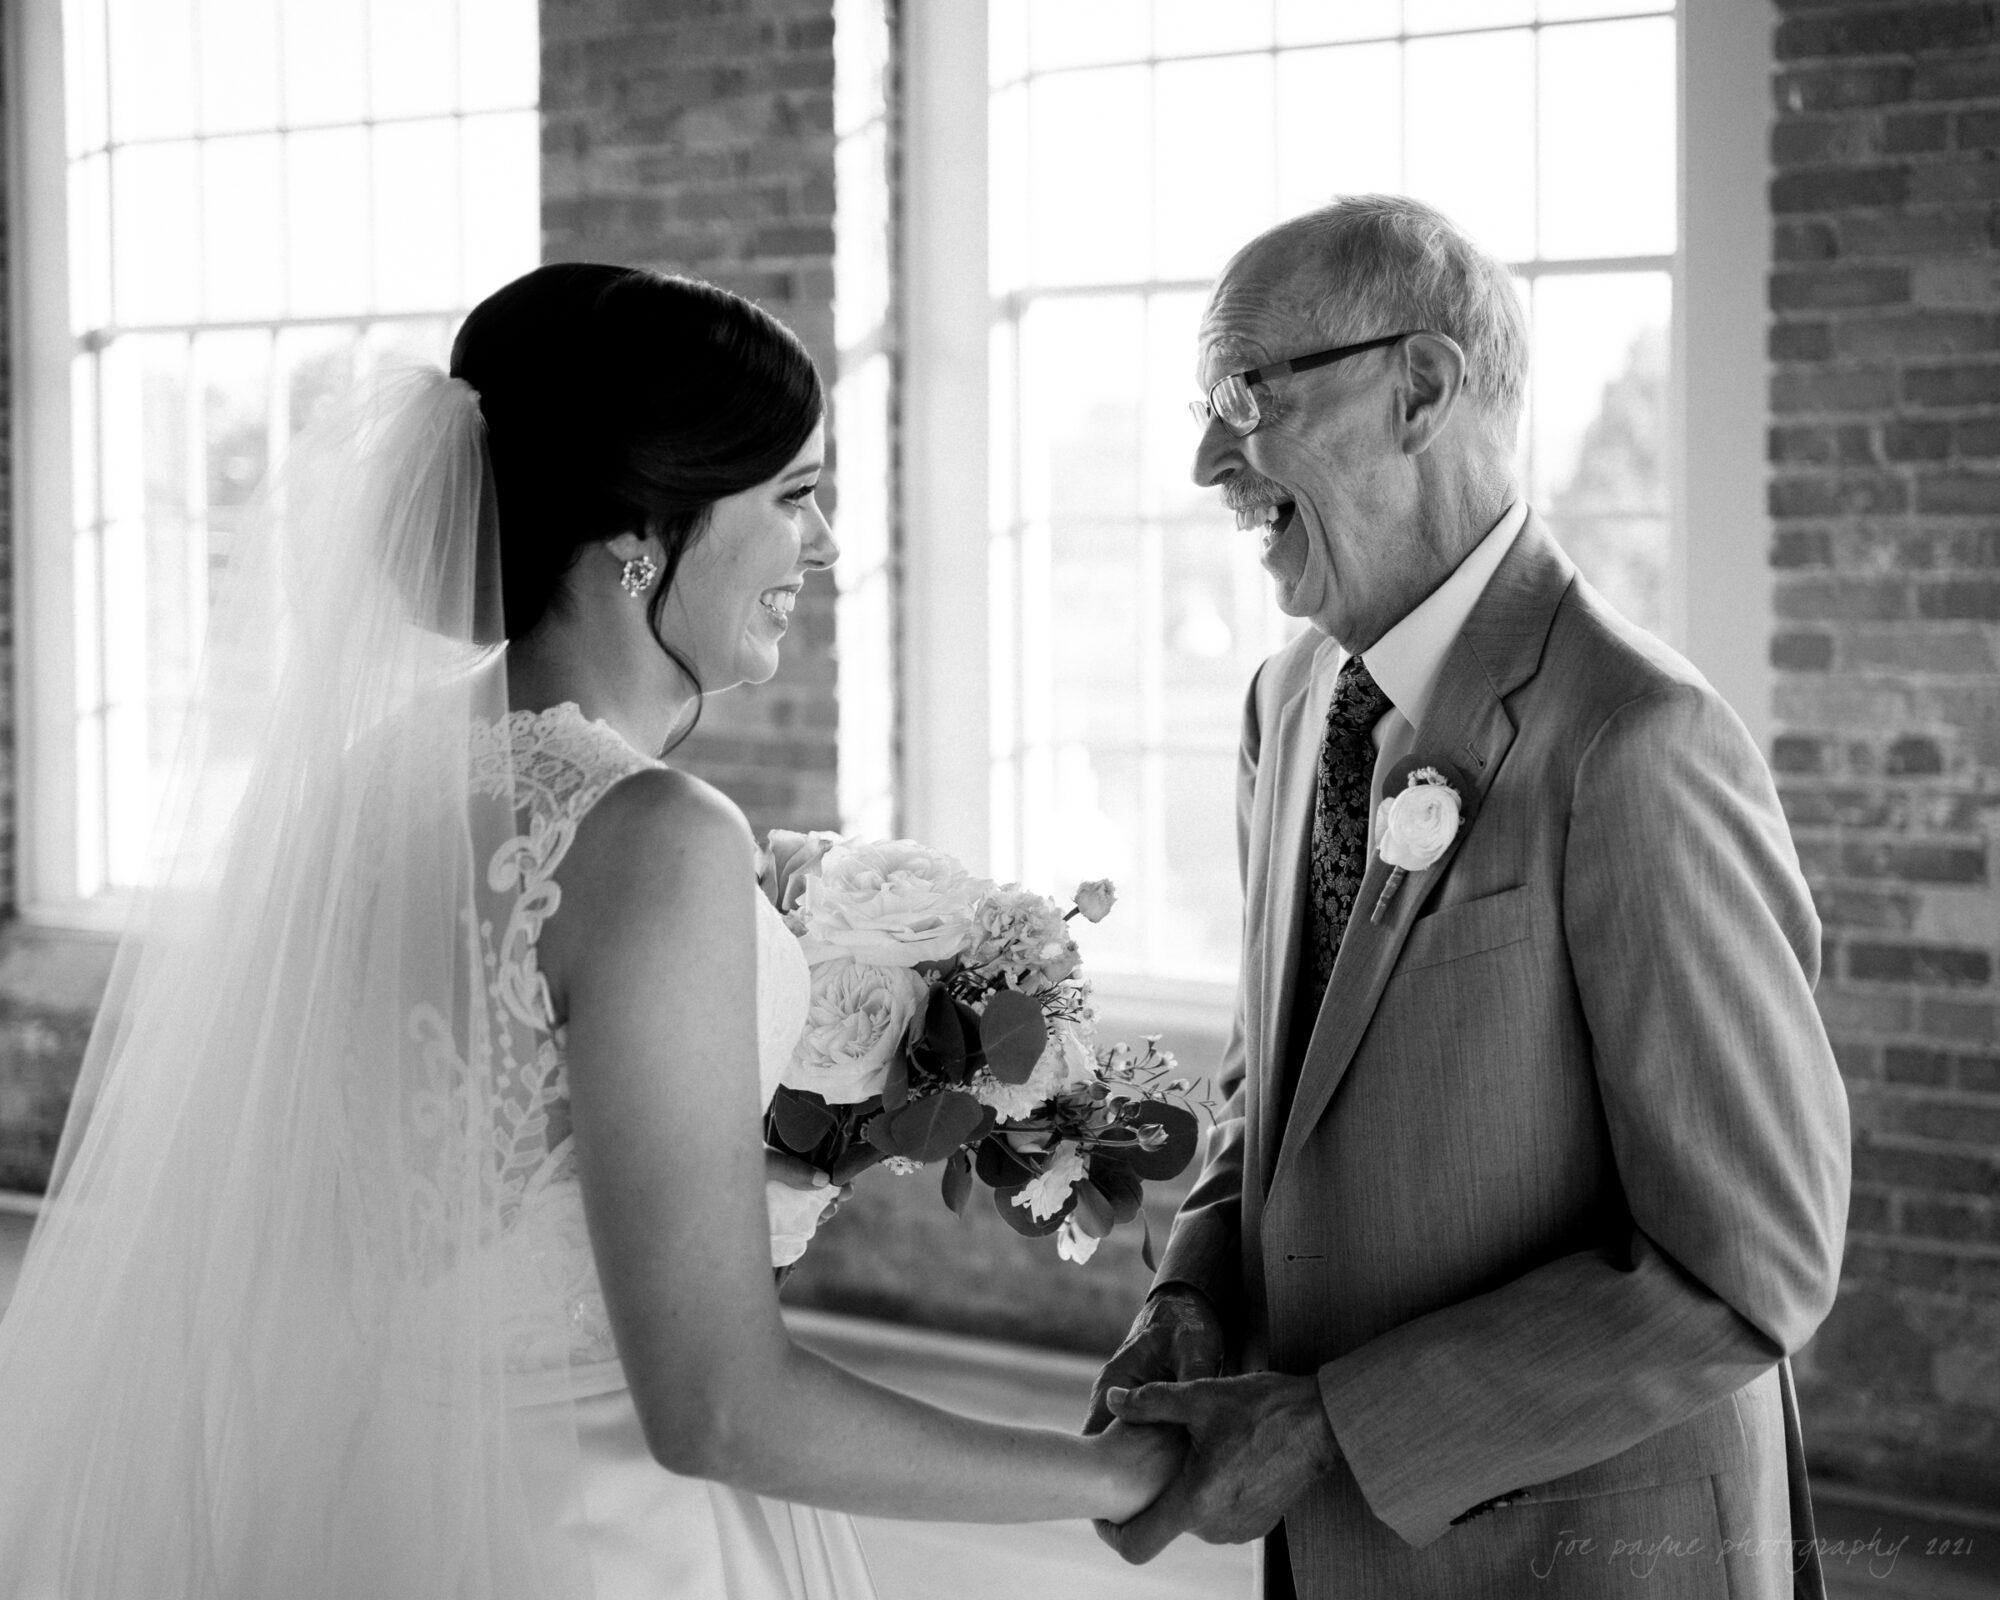 Cotton Room Wedding Photographer Kate Martin 24